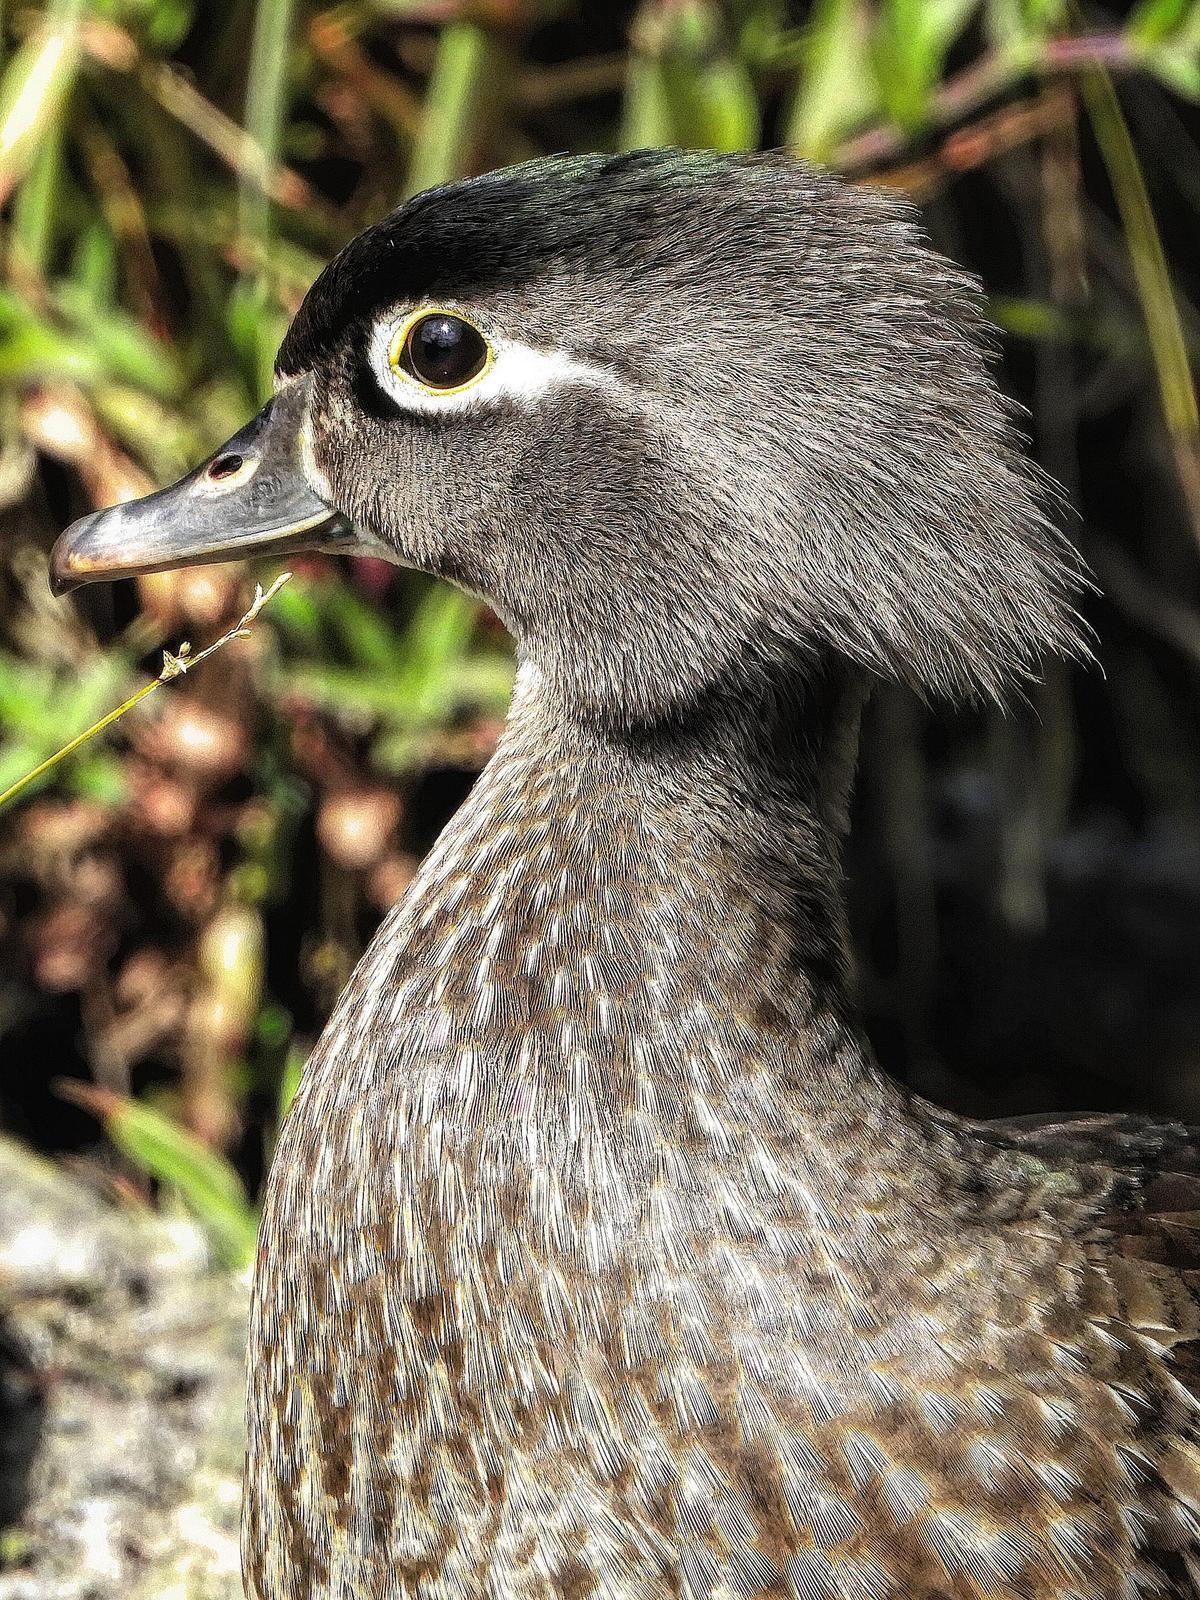 Wood Duck Photo by Dan Tallman